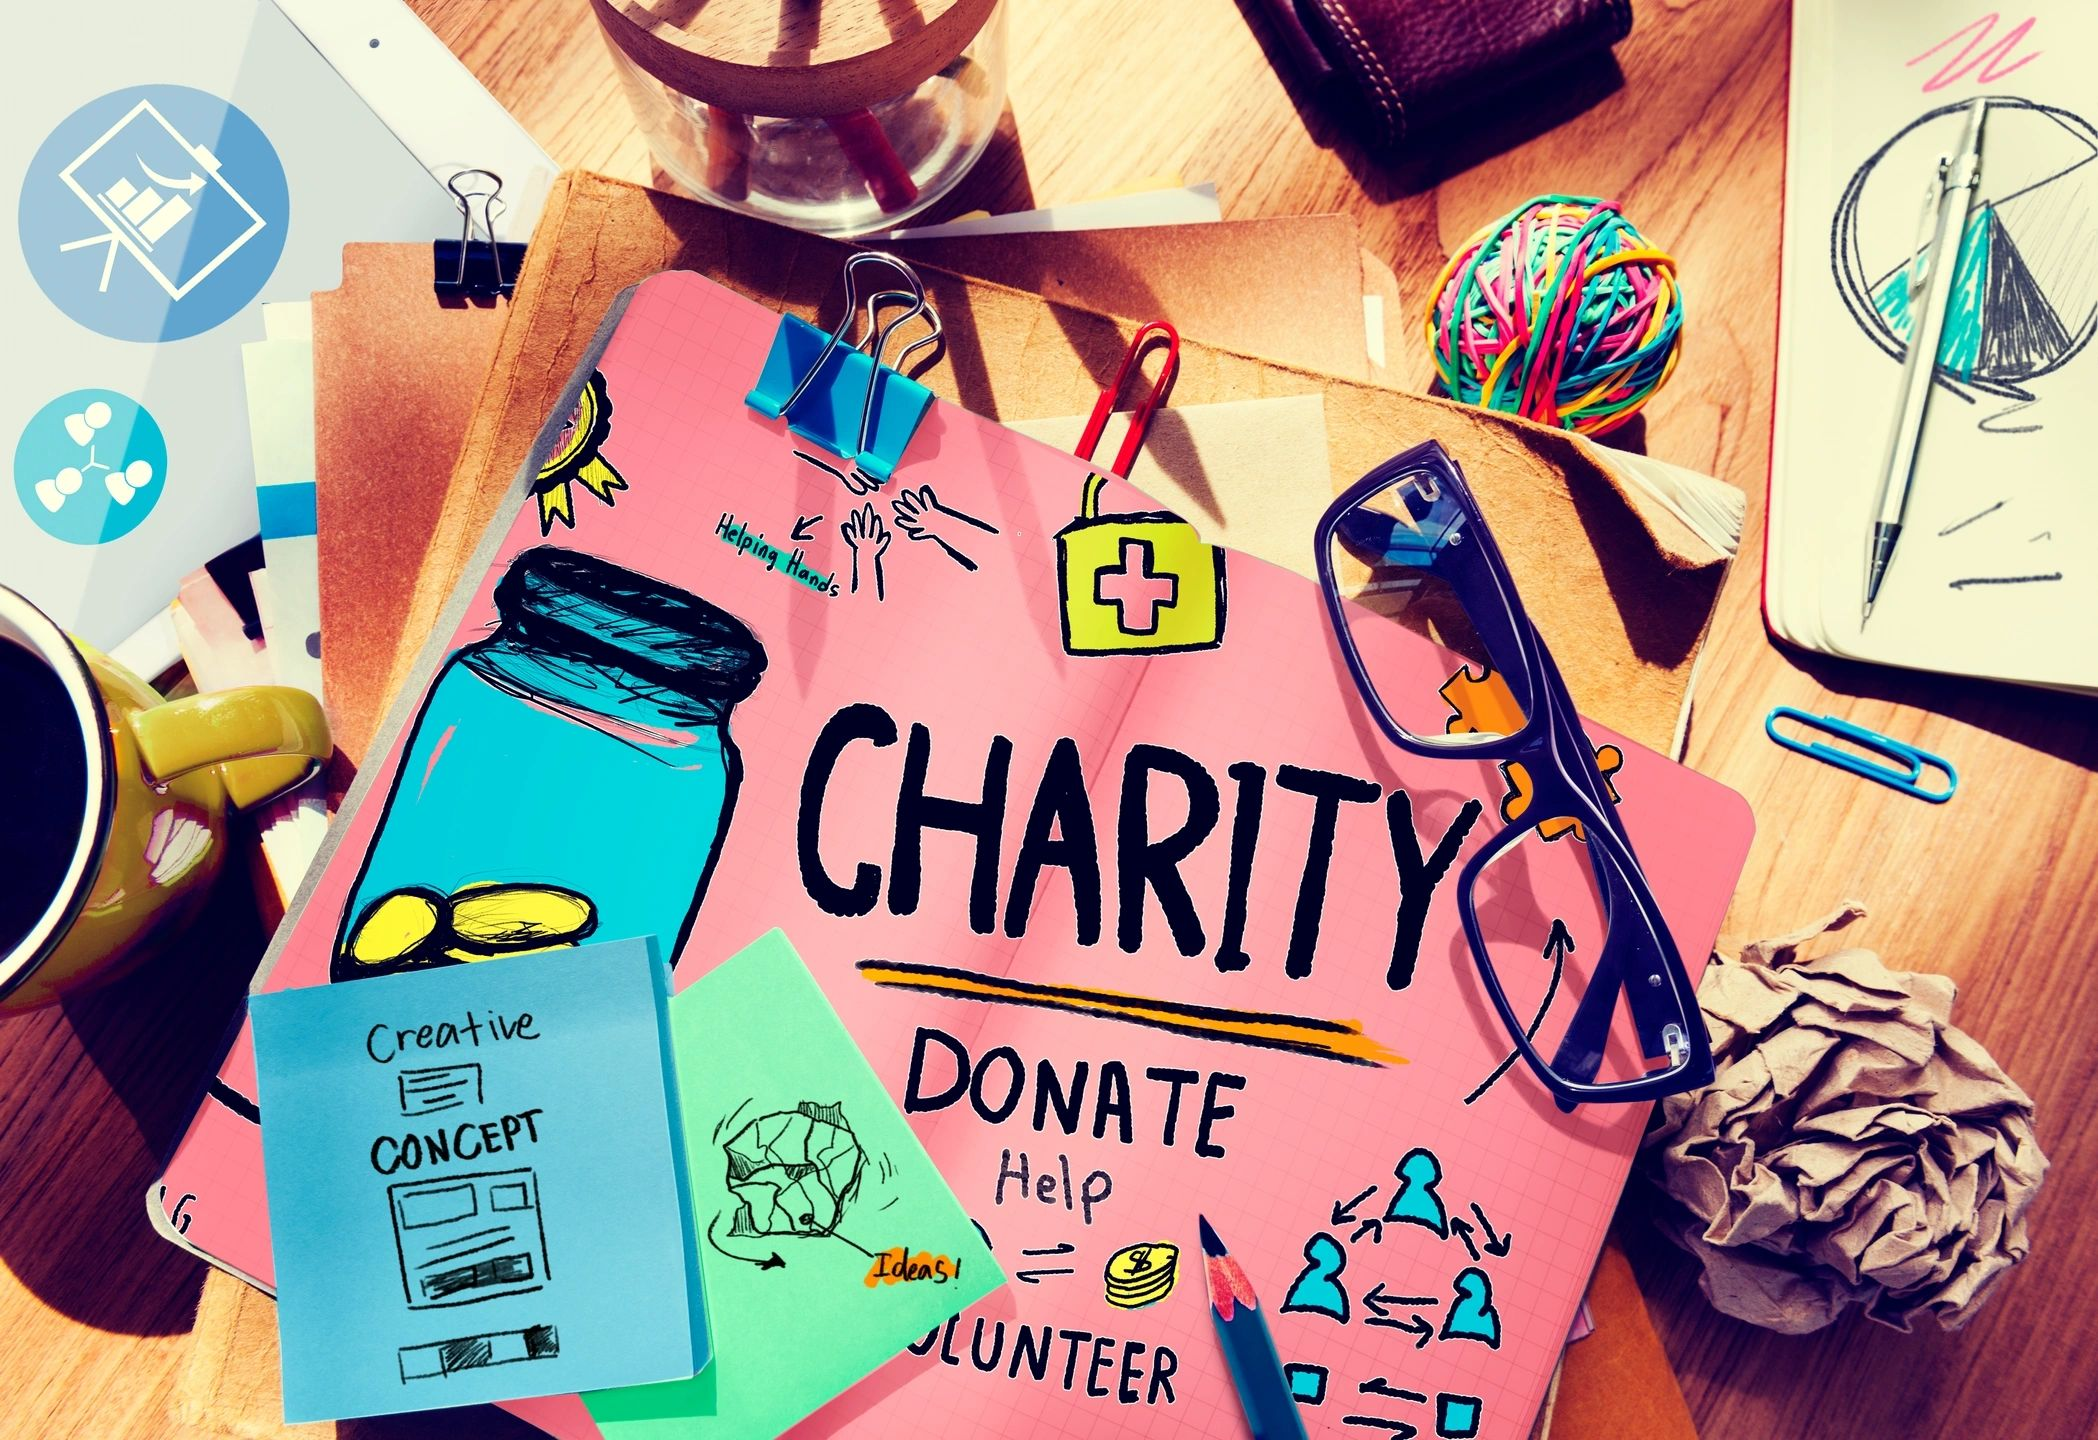 GFWC Junior Woman's Club of Lakeland Charity Donations